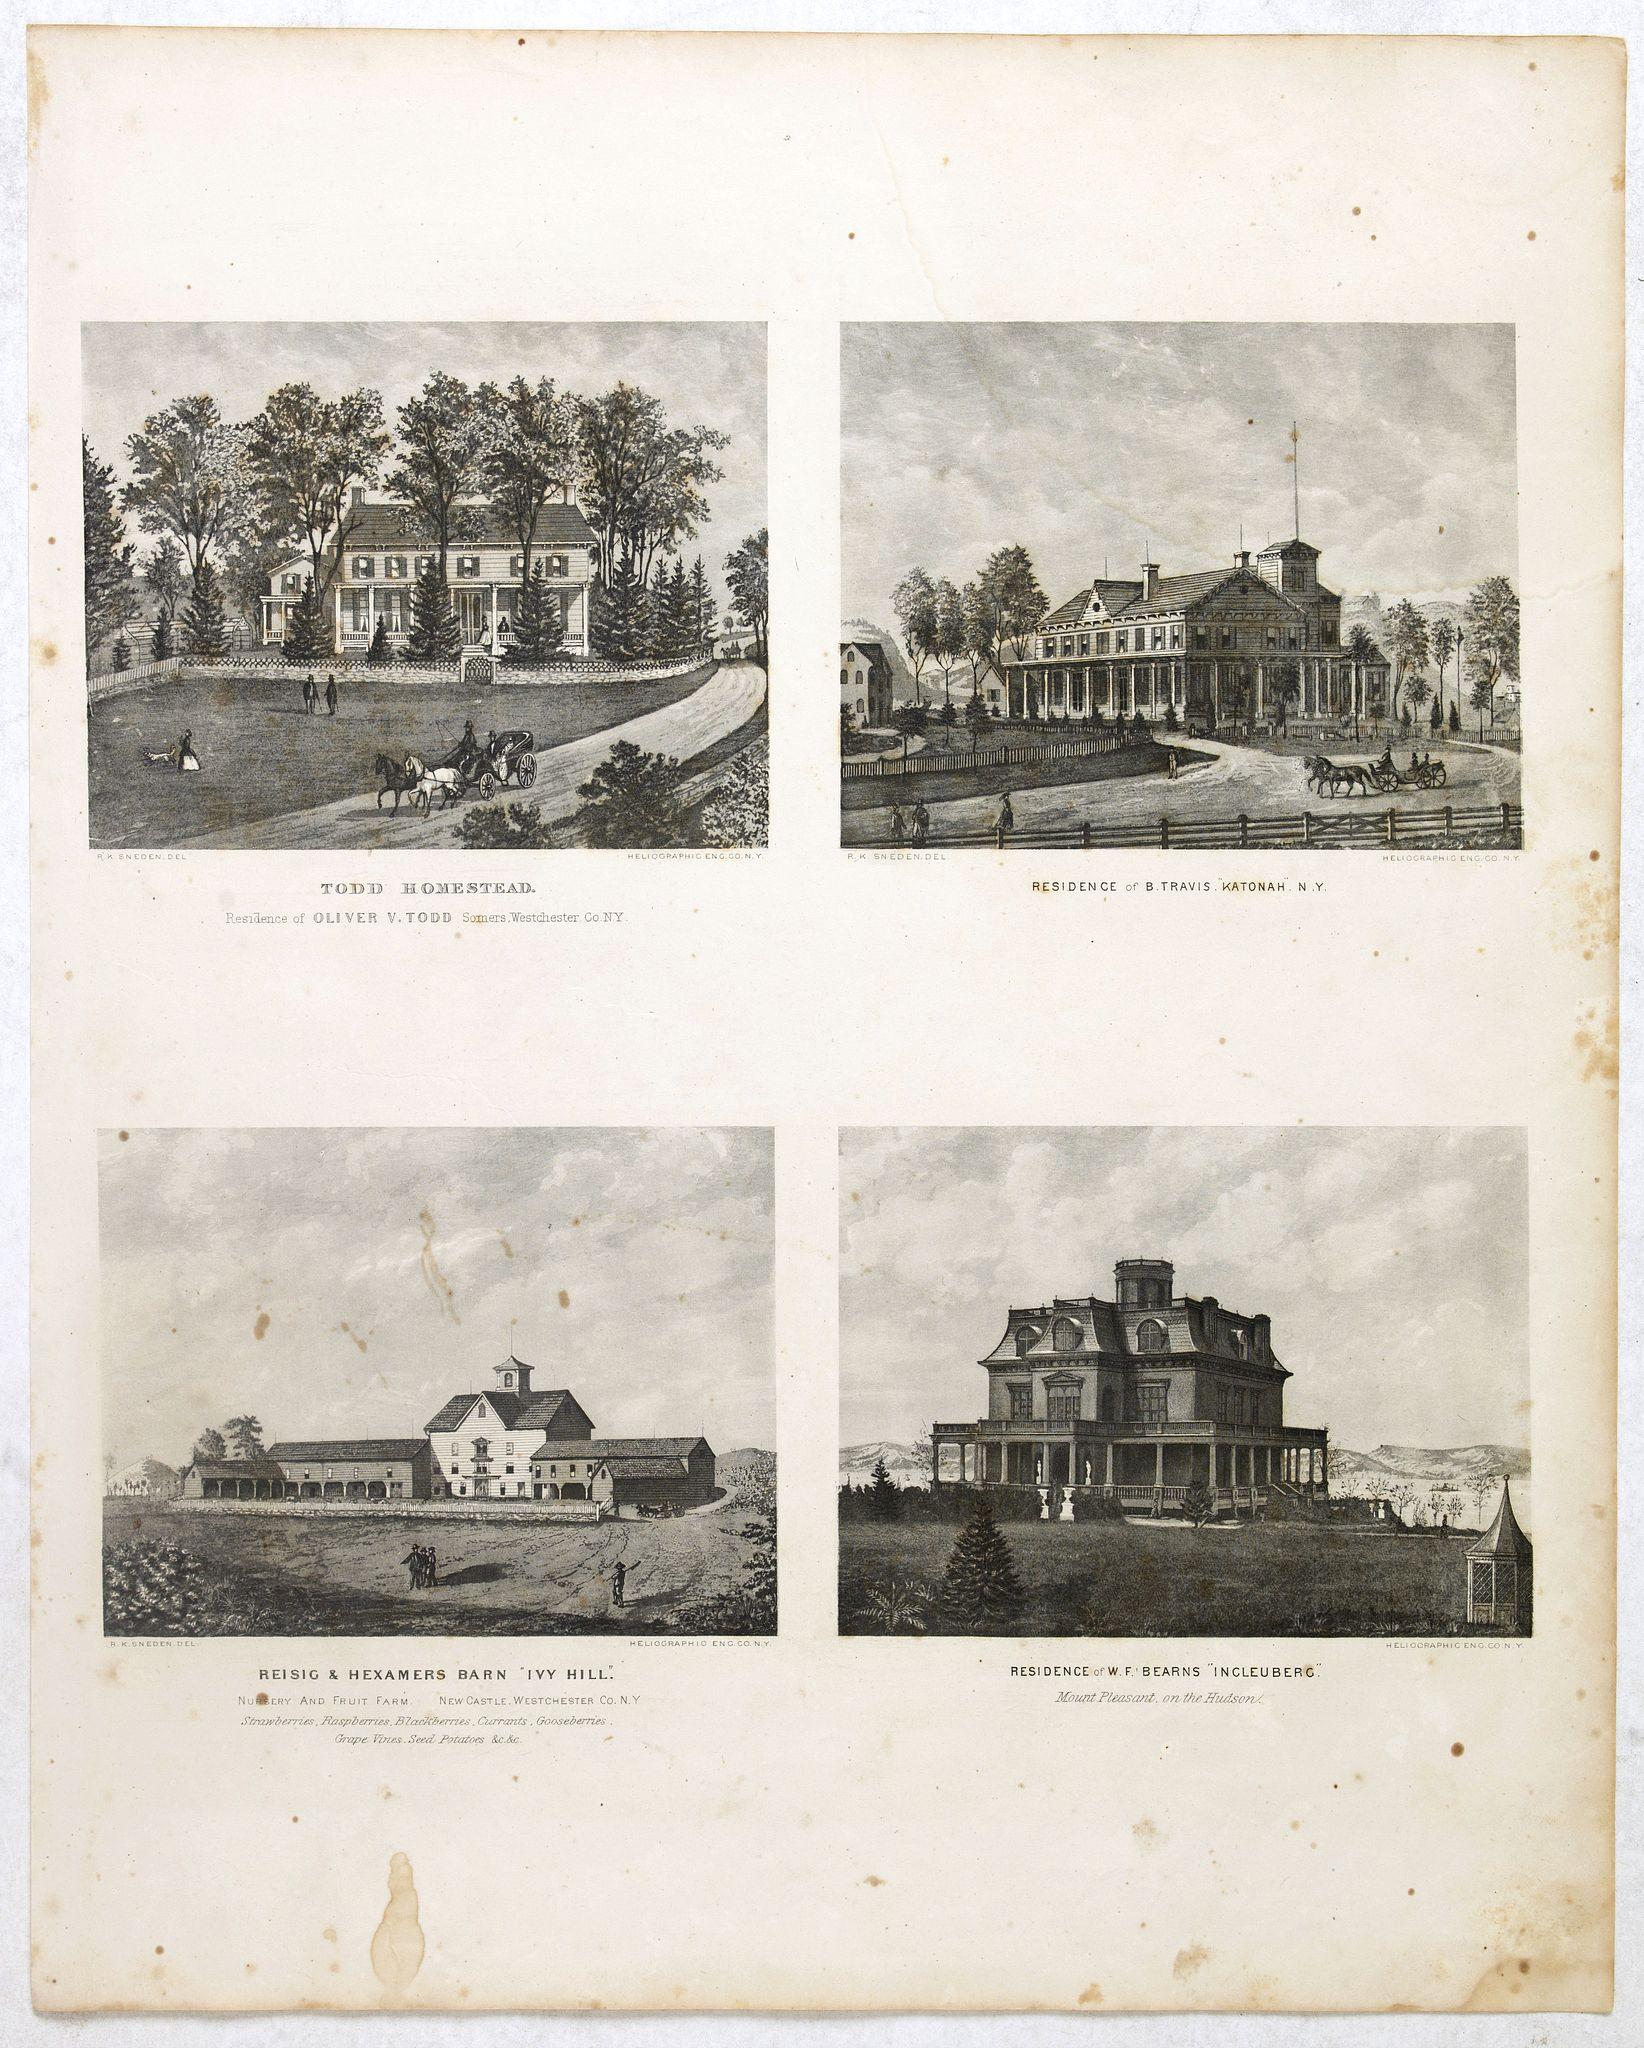 DE BEERS, F.W. -  Todd Homestead / Résidence of B. Travis Katonah N.Y / Reisig & HexamersBarn Ivy Hill /  Résidence of W.F Bearns